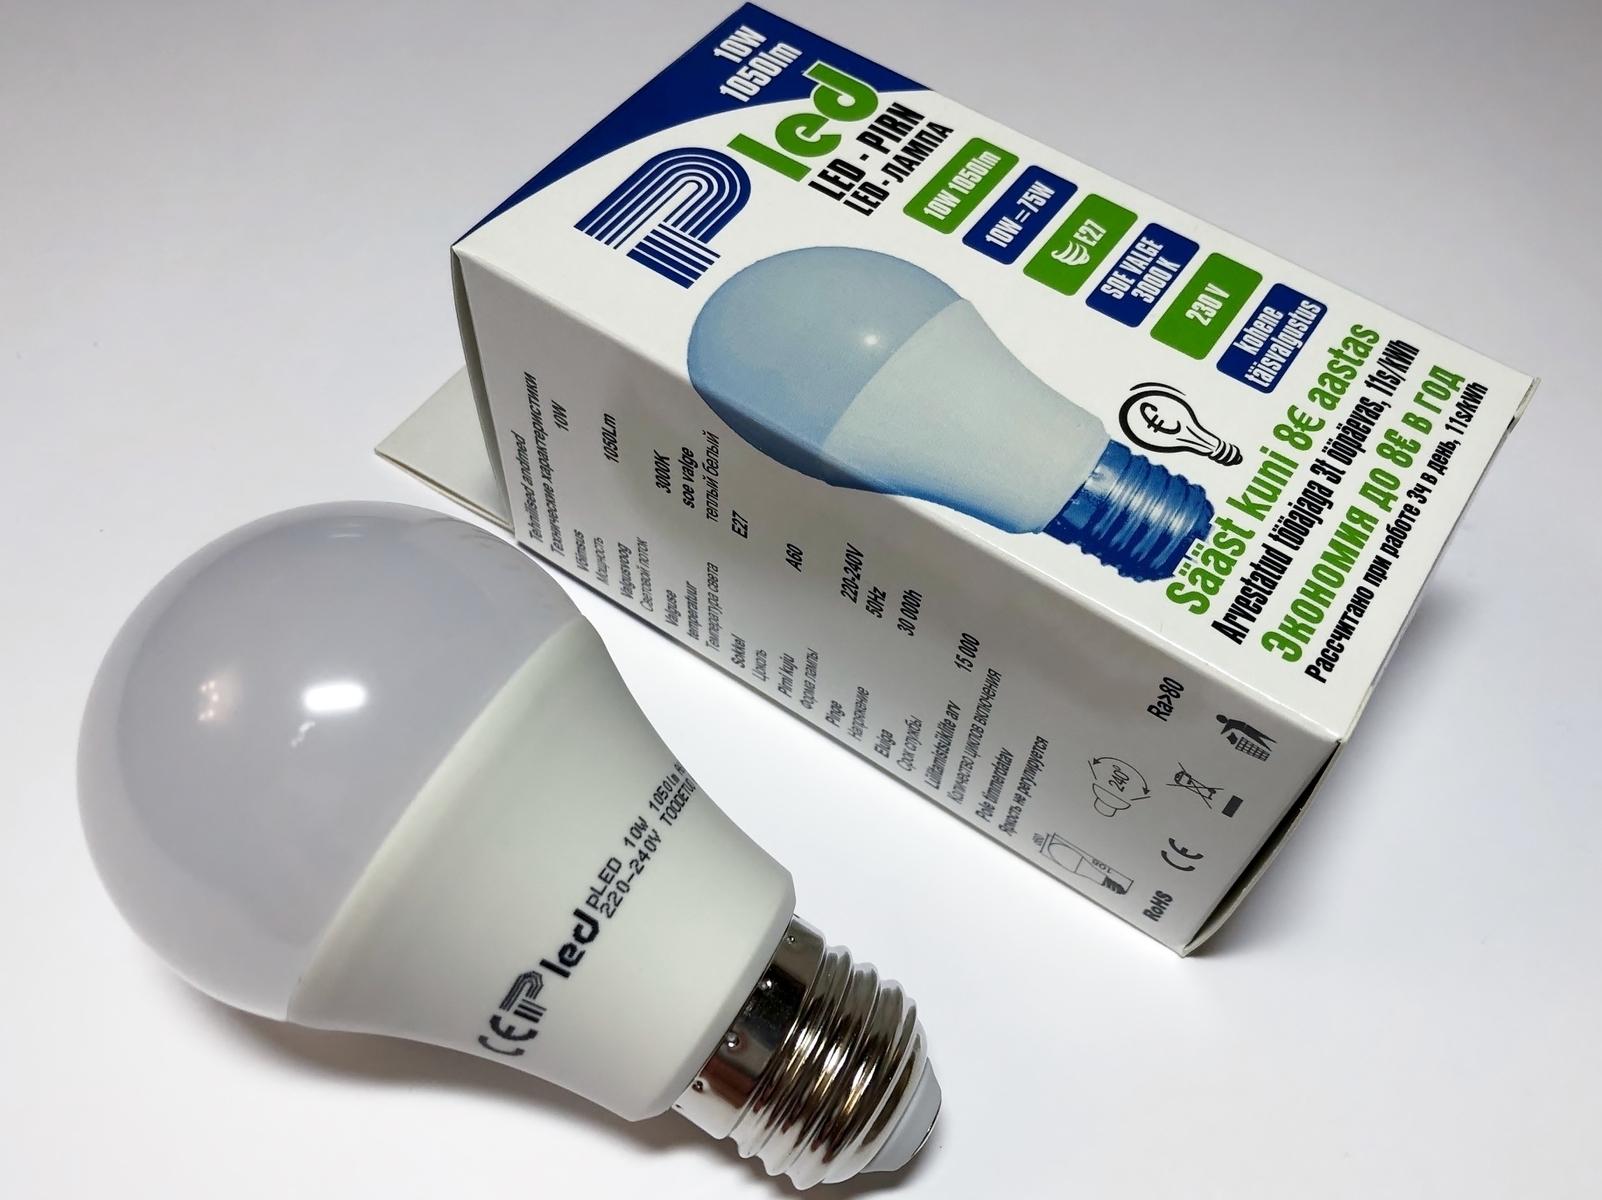 LED lamp 10 W, Pled, A60, Pluvo